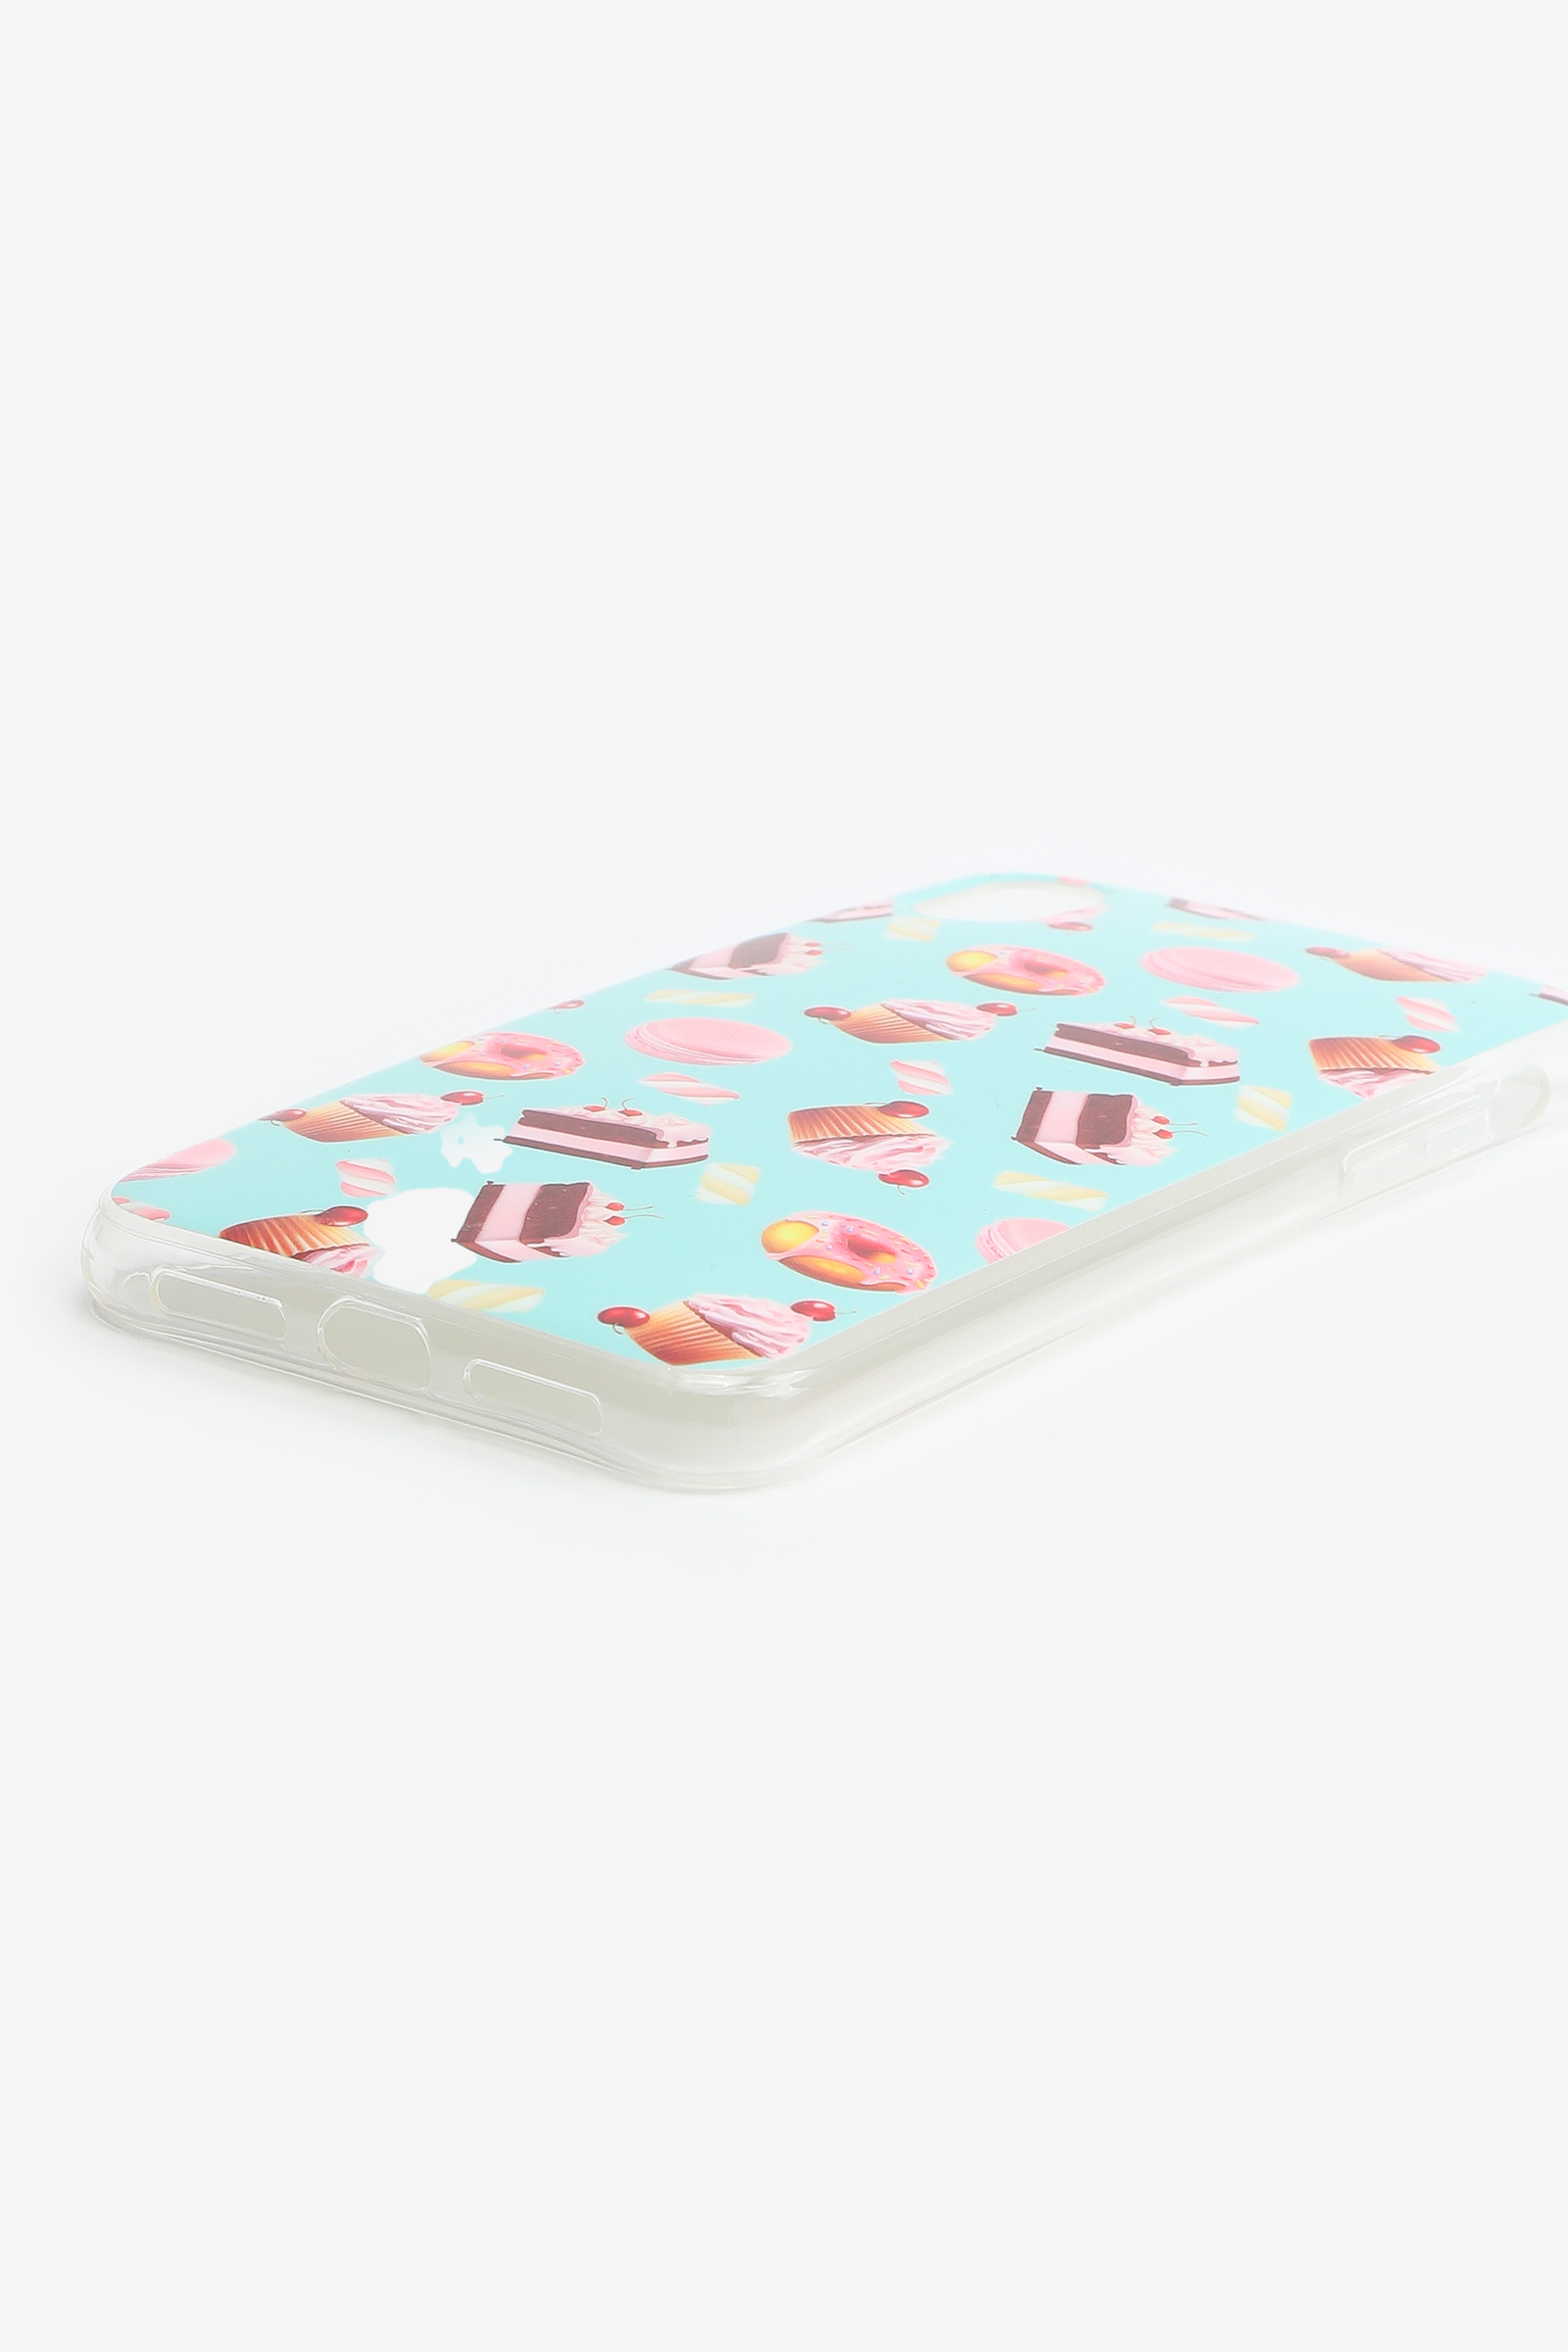 Cake iPhone XR Case